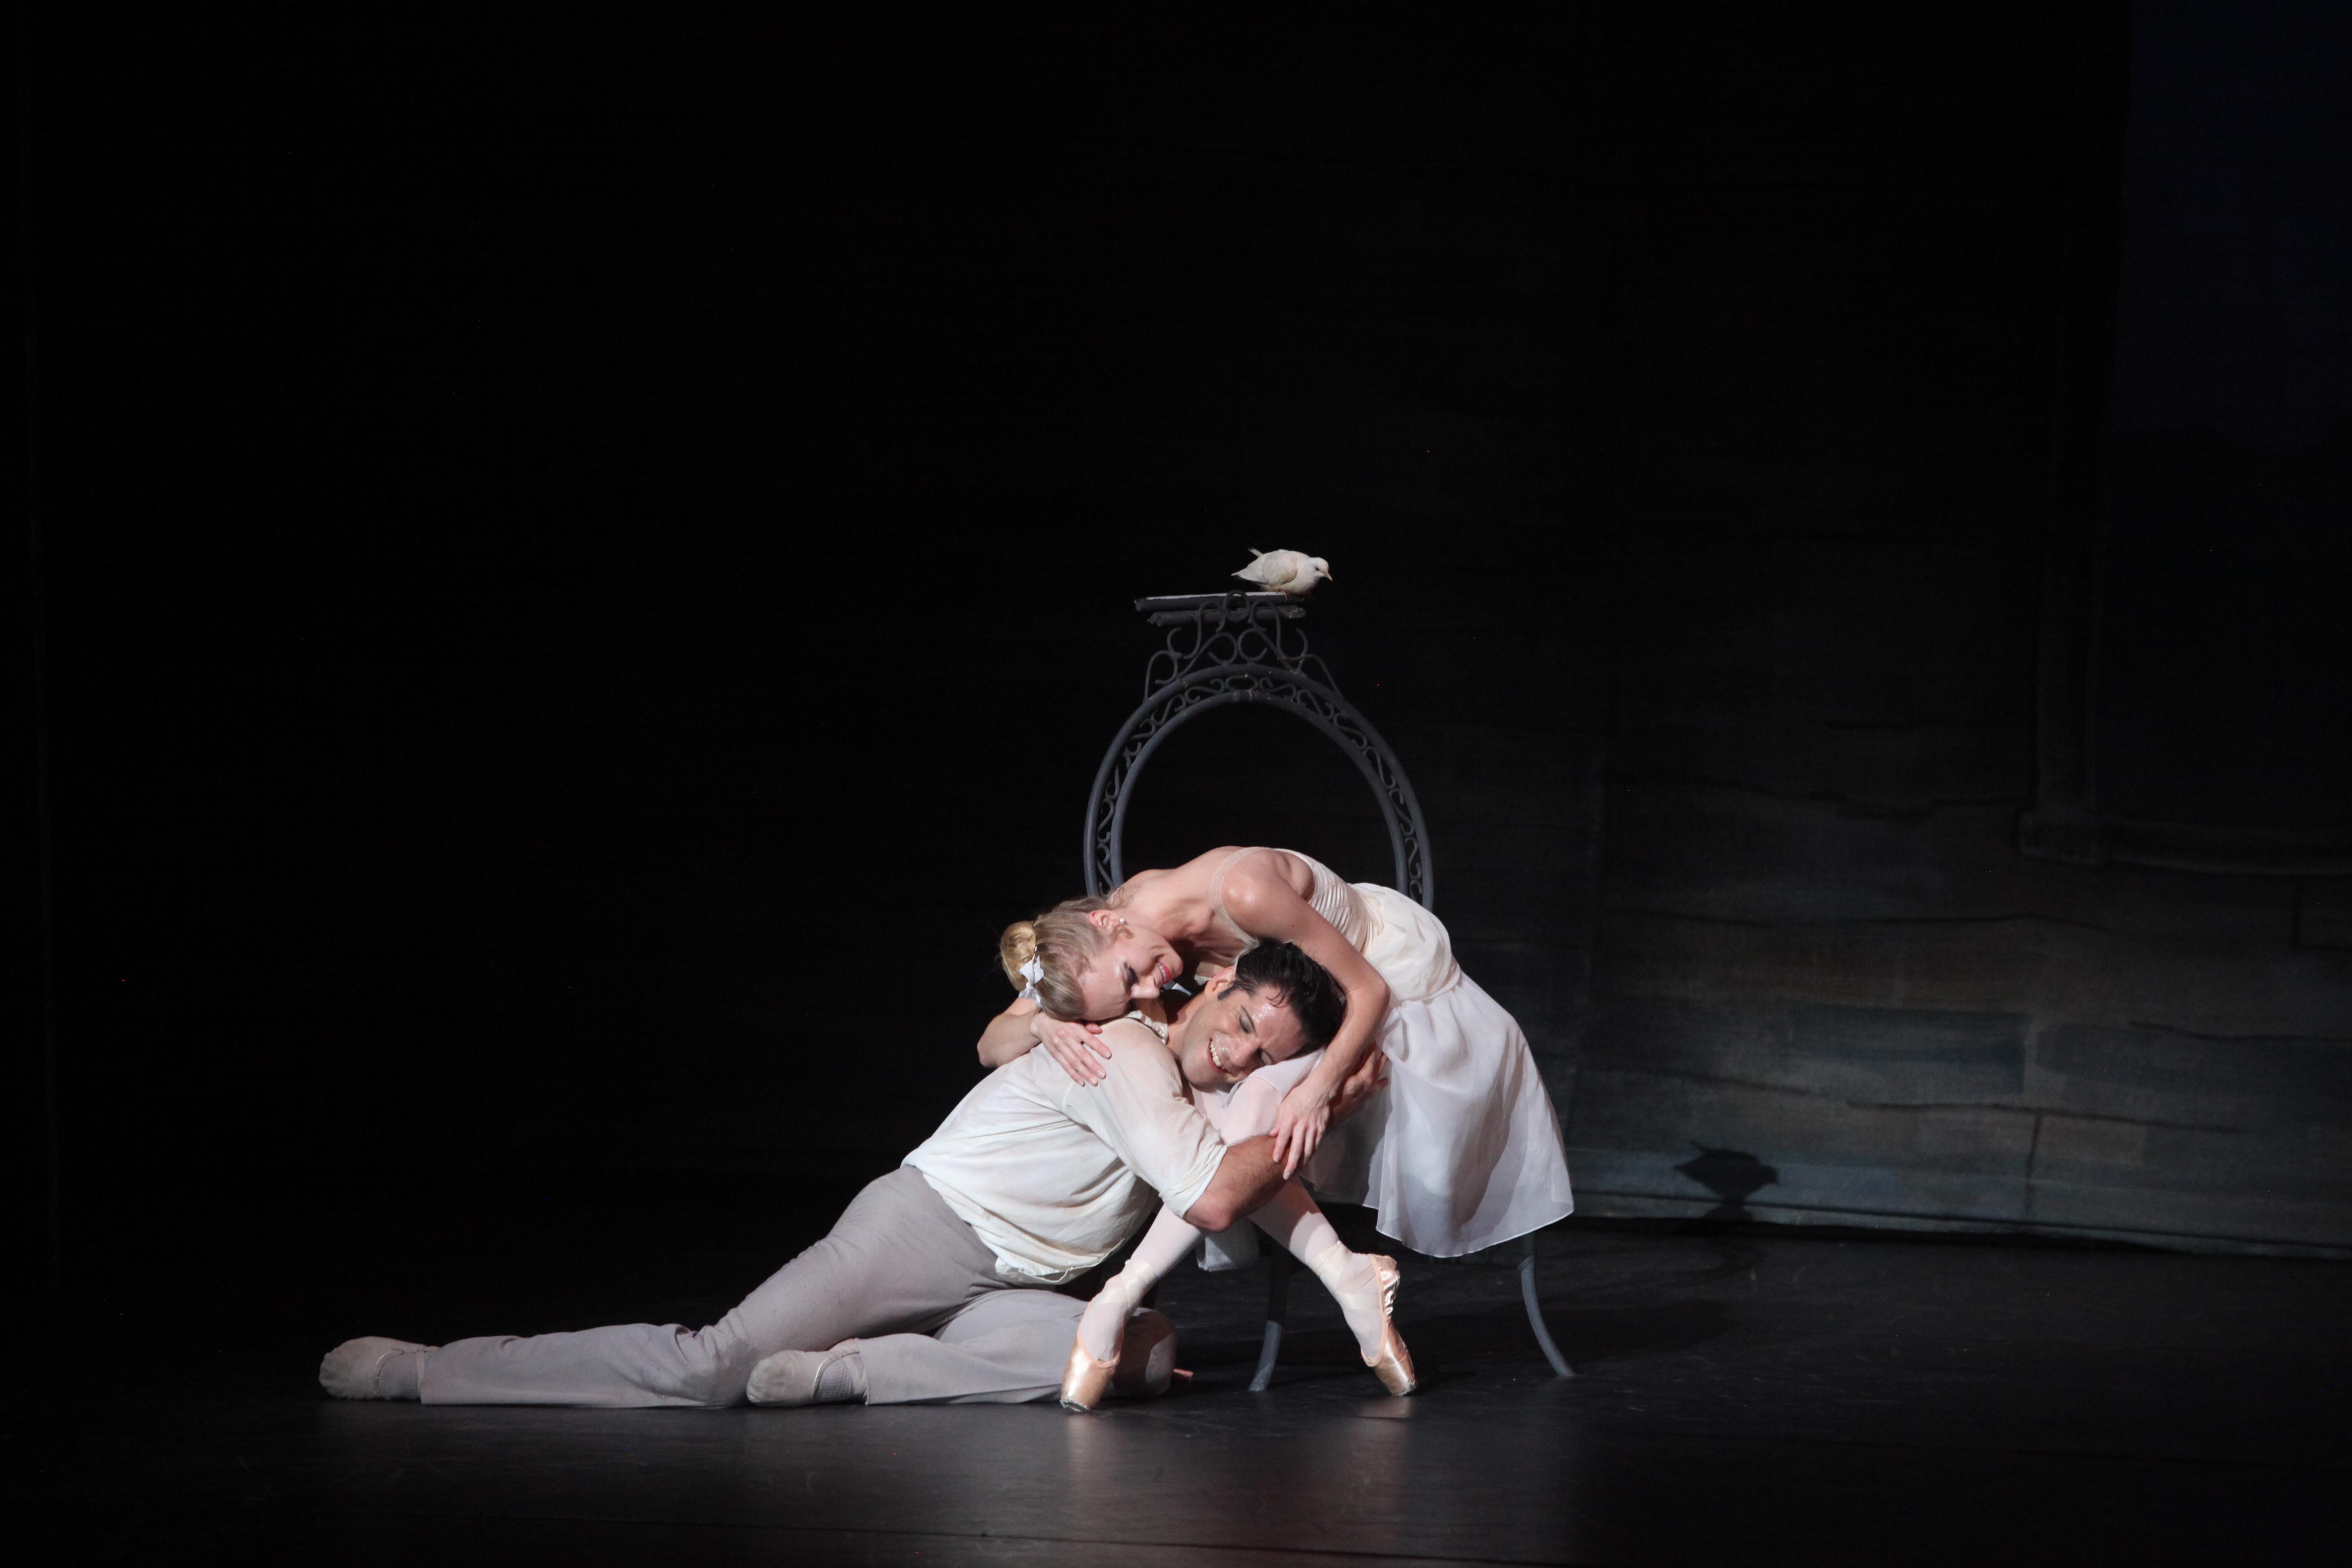 BWW Review: A TRIBUTE TO ASHTON at Sarasota Ballet